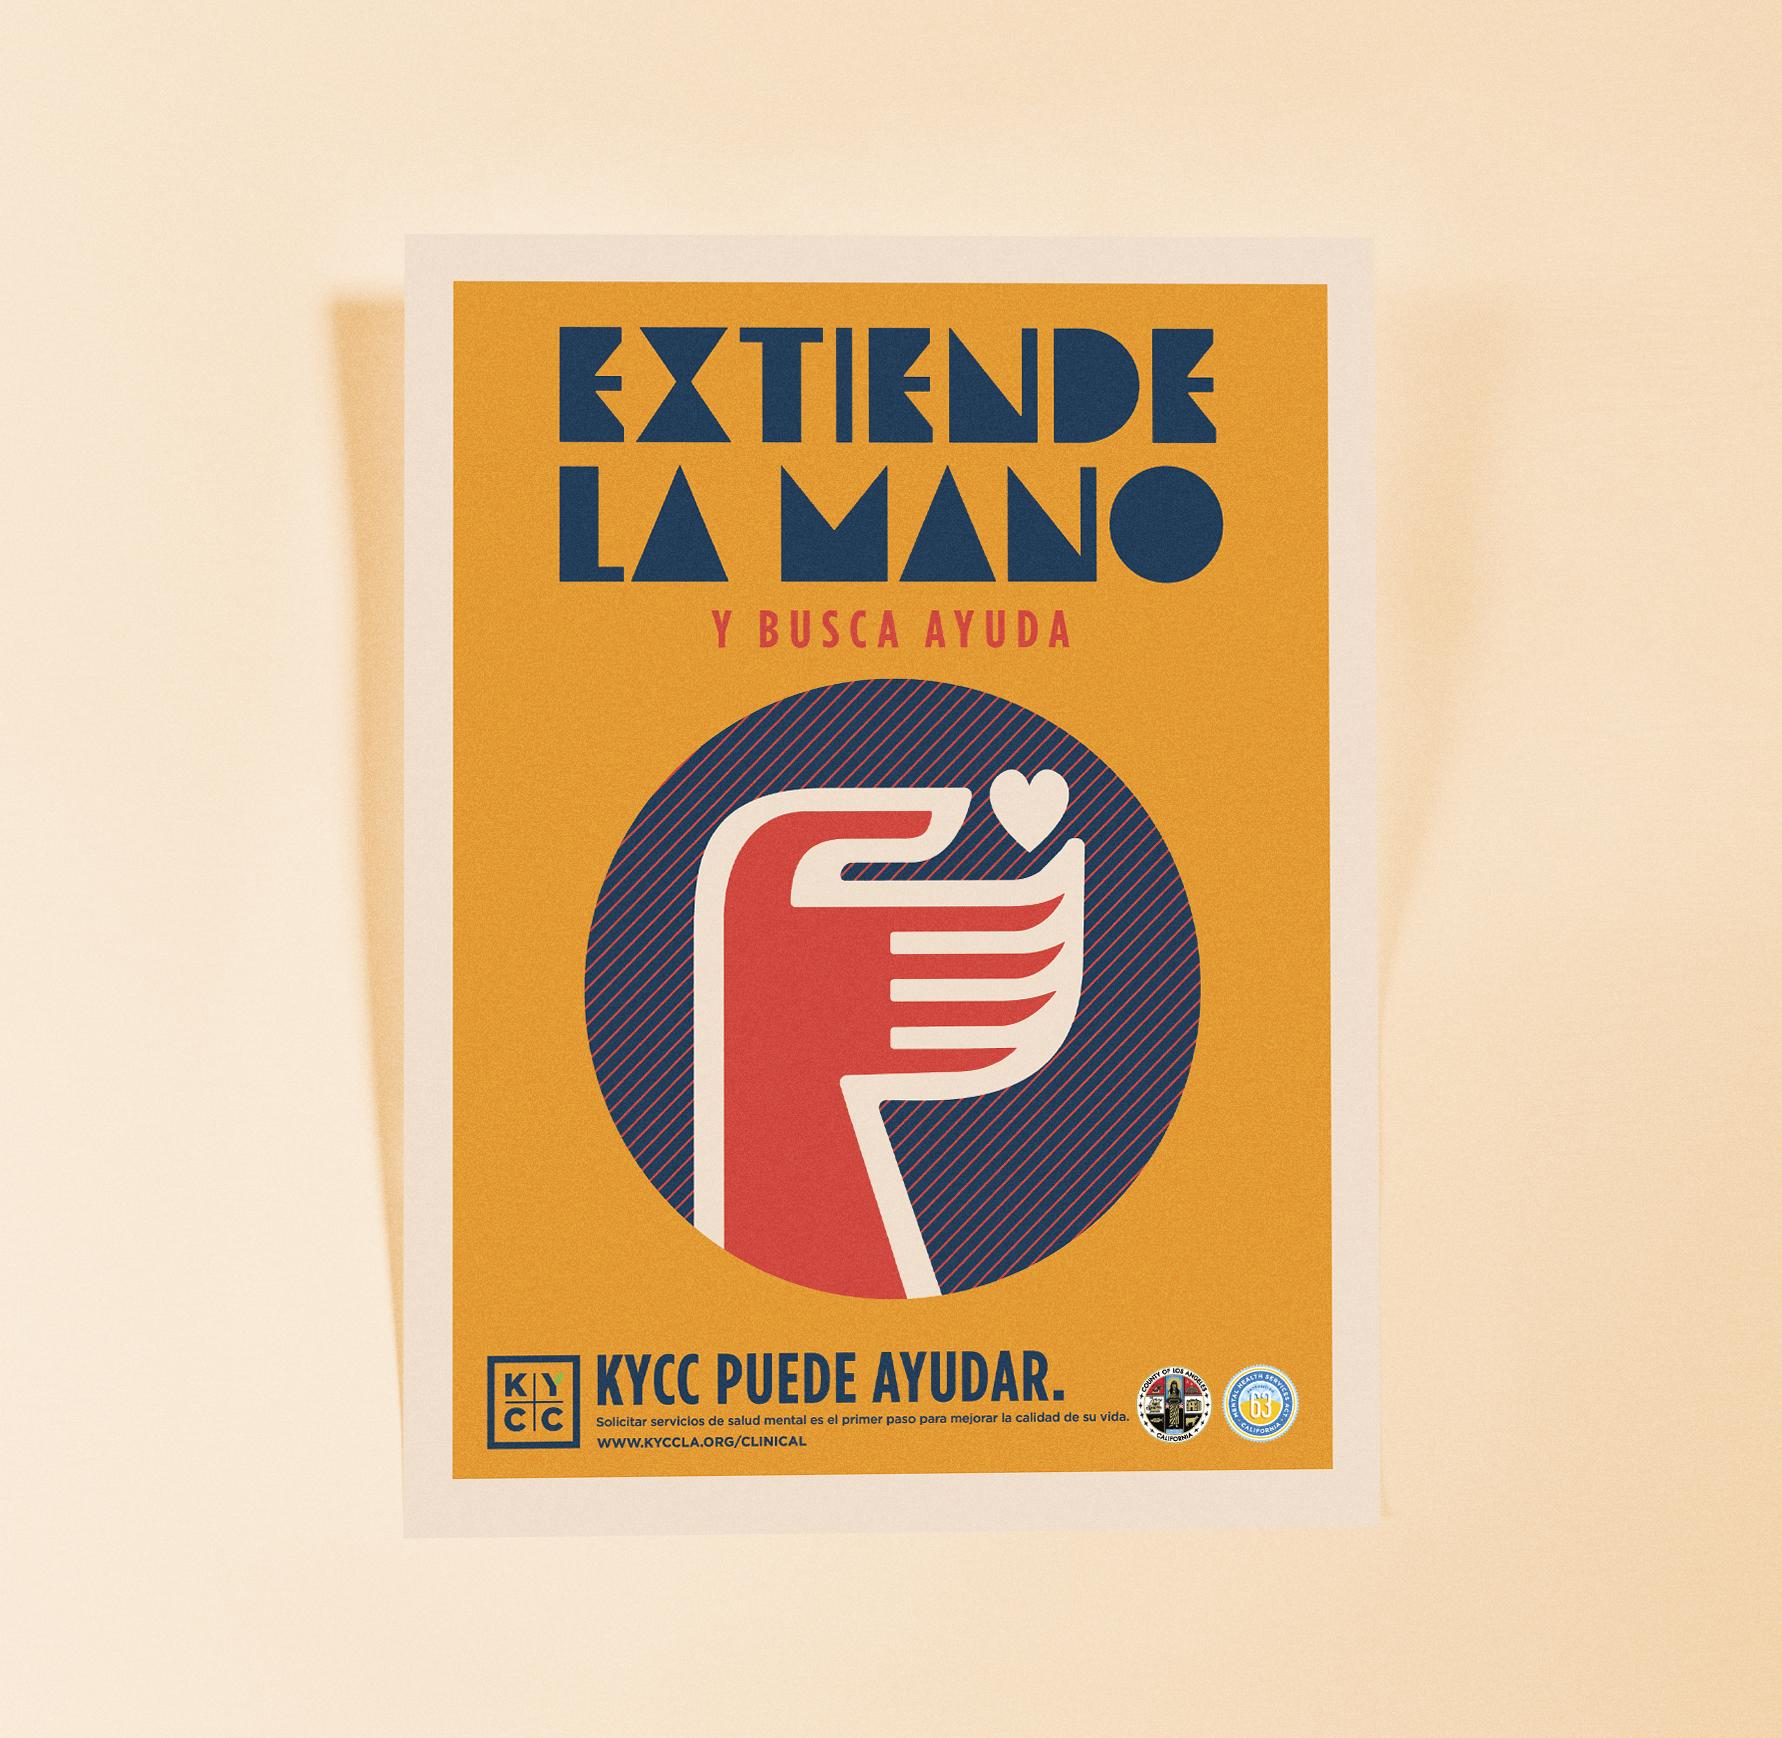 KYCC_MH_Poster_Spanish.jpg